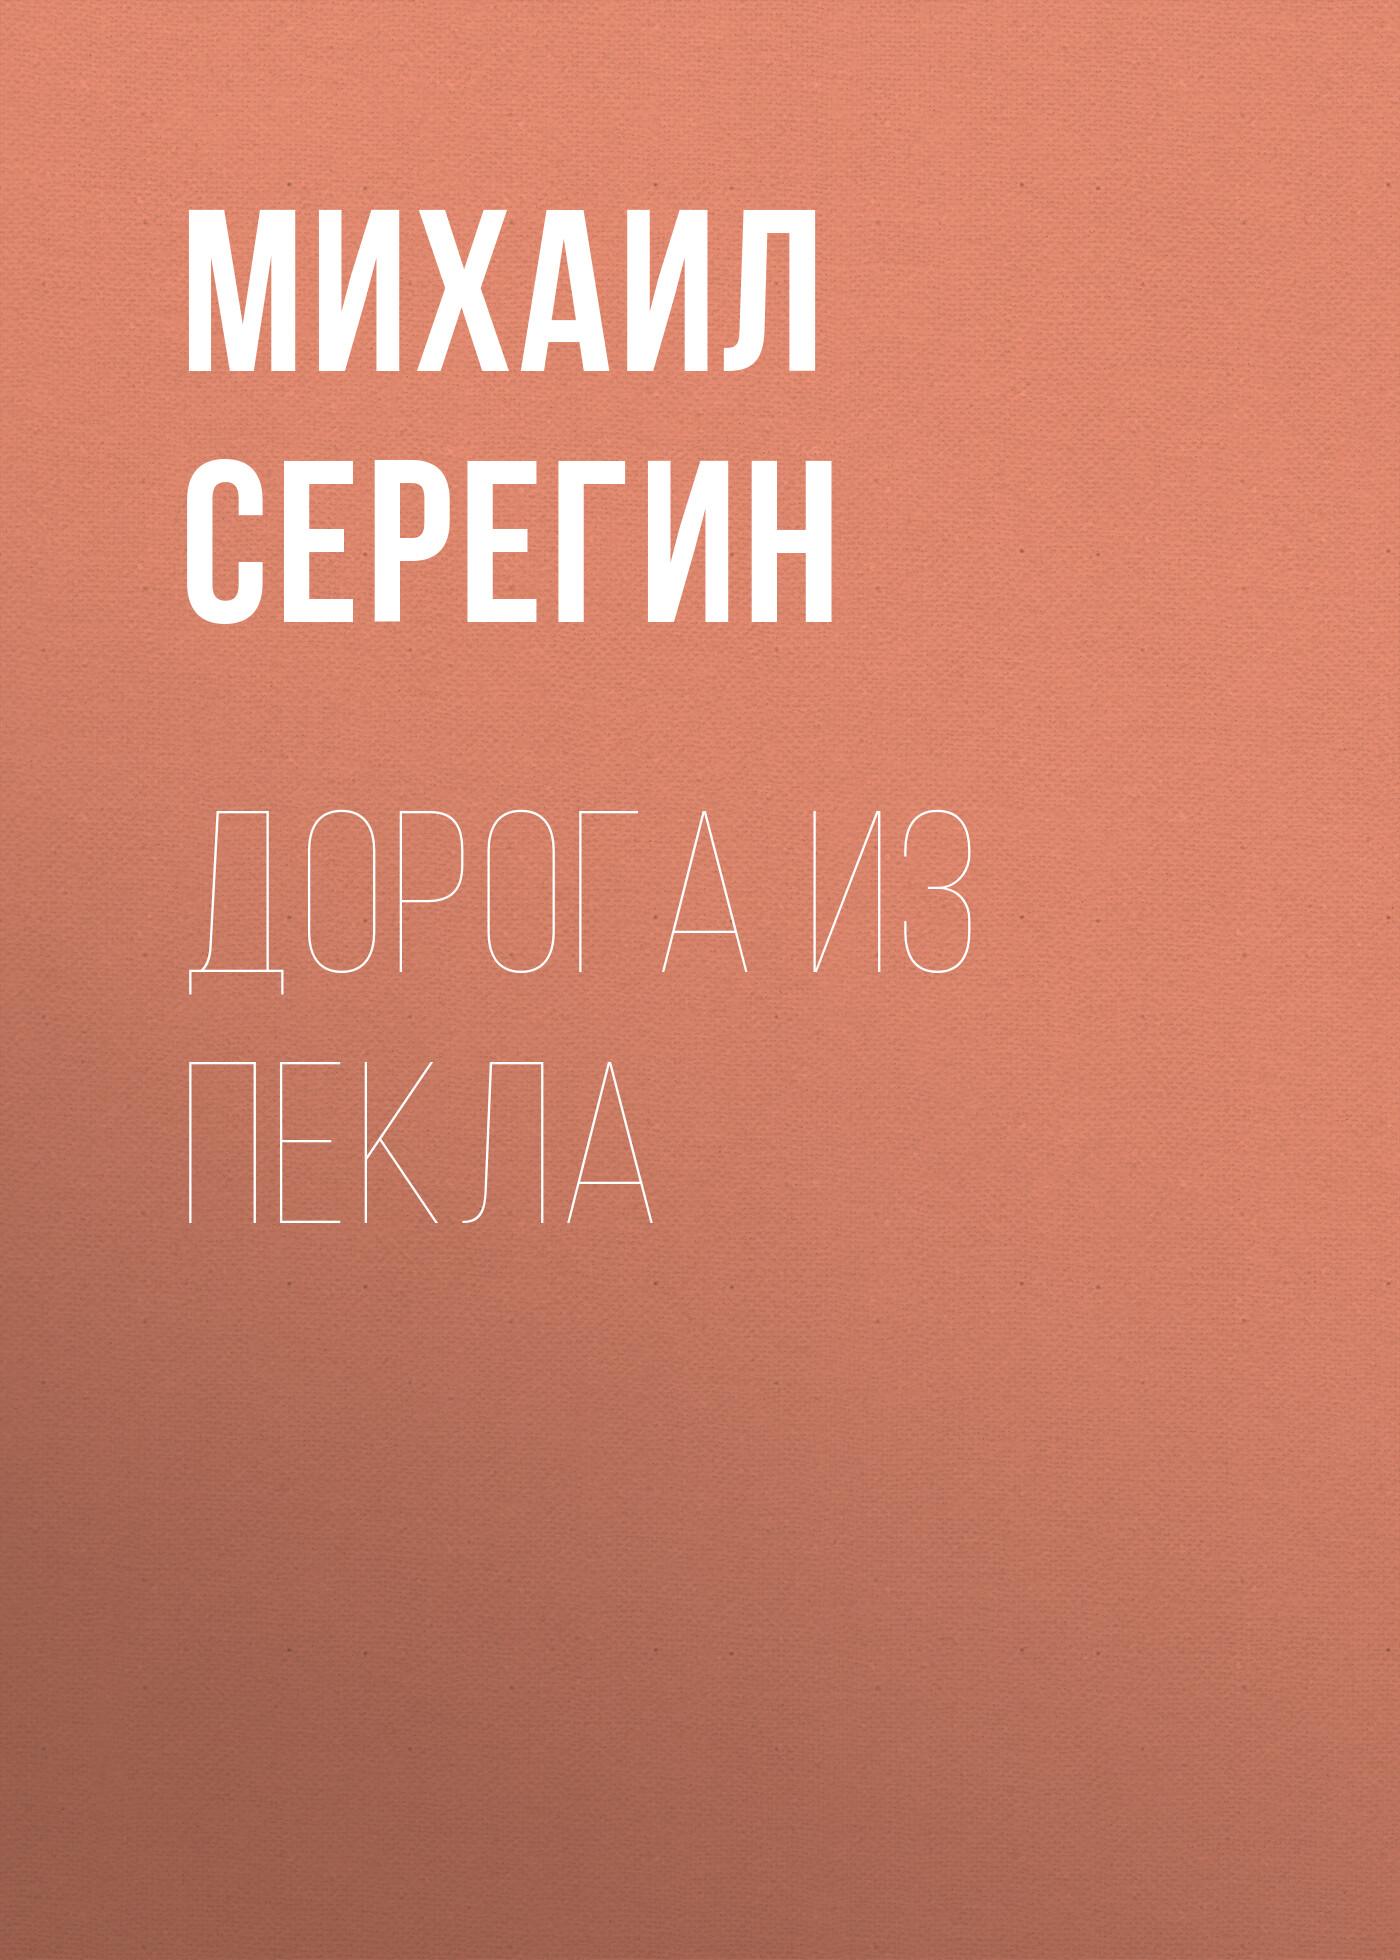 Михаил Серегин Дорога из пекла михаил серегин тайна черного ящика